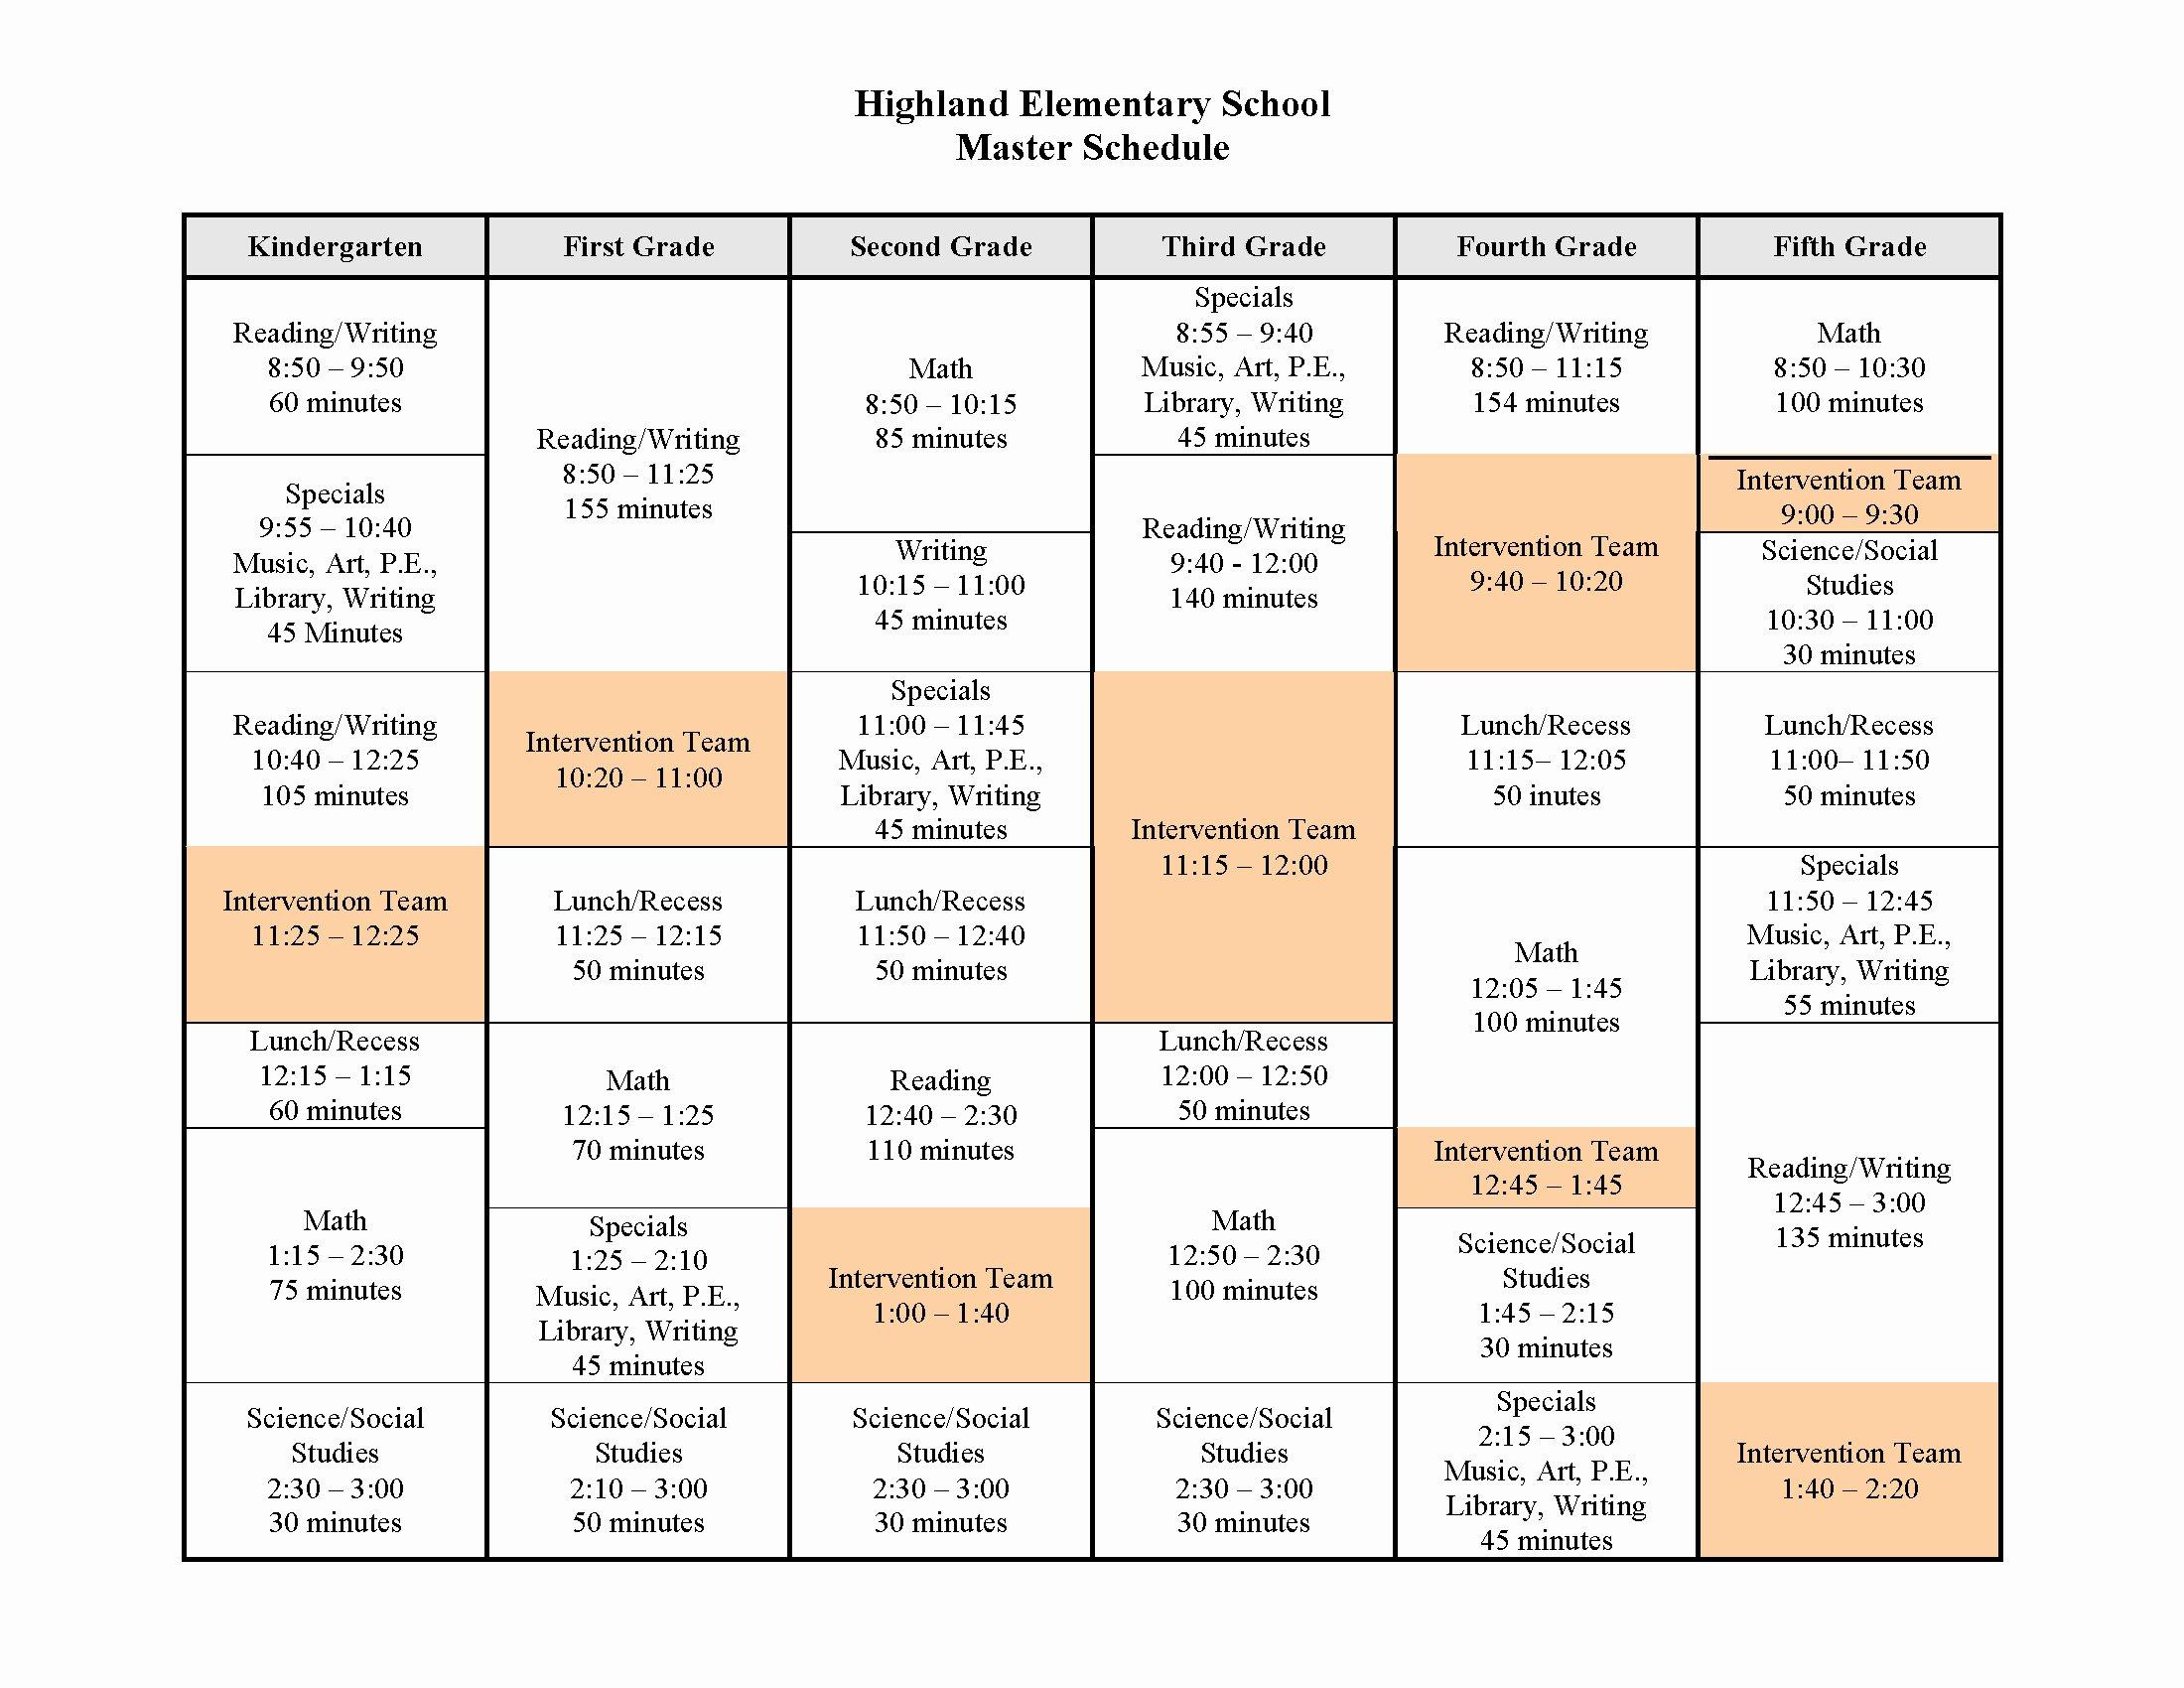 High School Schedule Template Beautiful School Master Junglekey Image 50